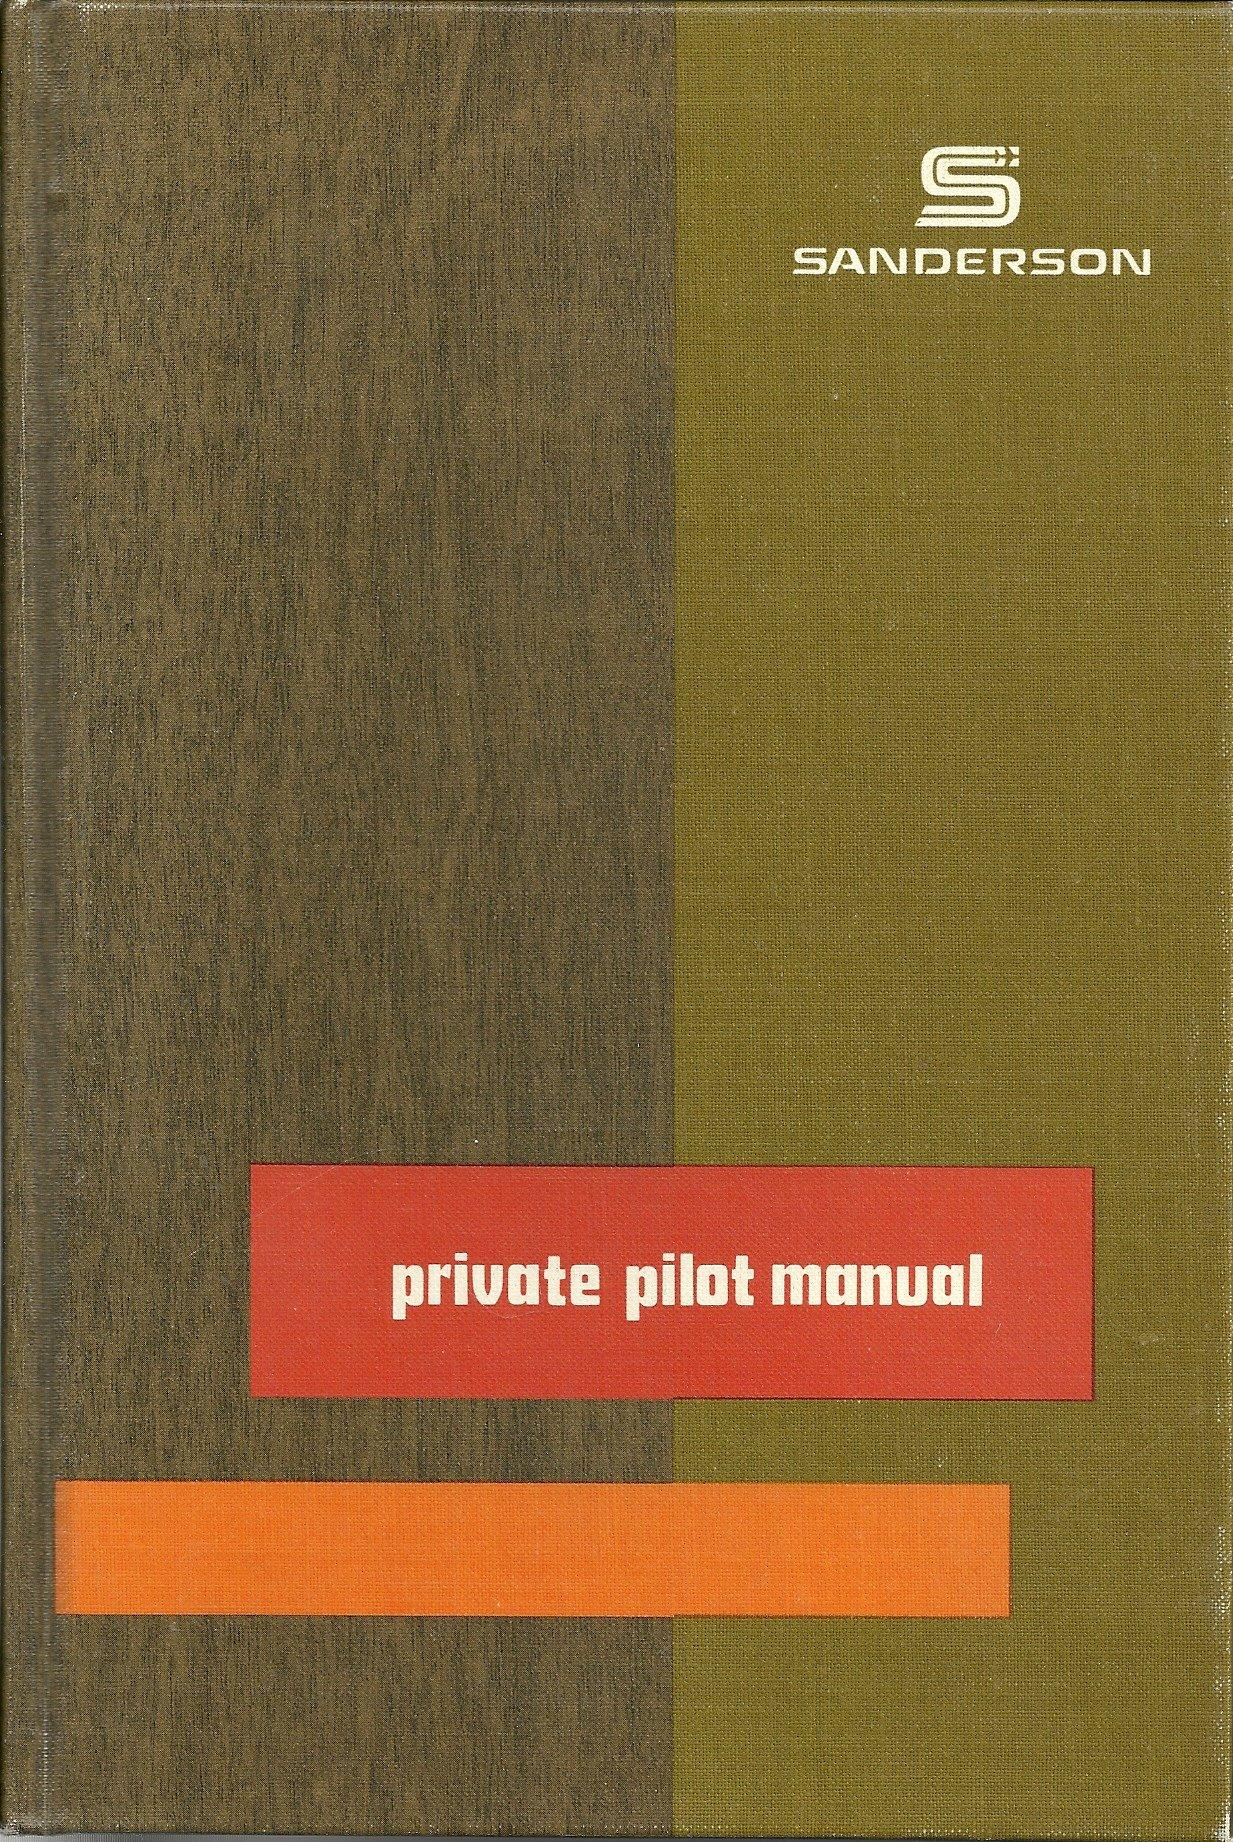 Private Pilot Manual: Jeppesen Sanderson: 9780884871064: Amazon.com: Books